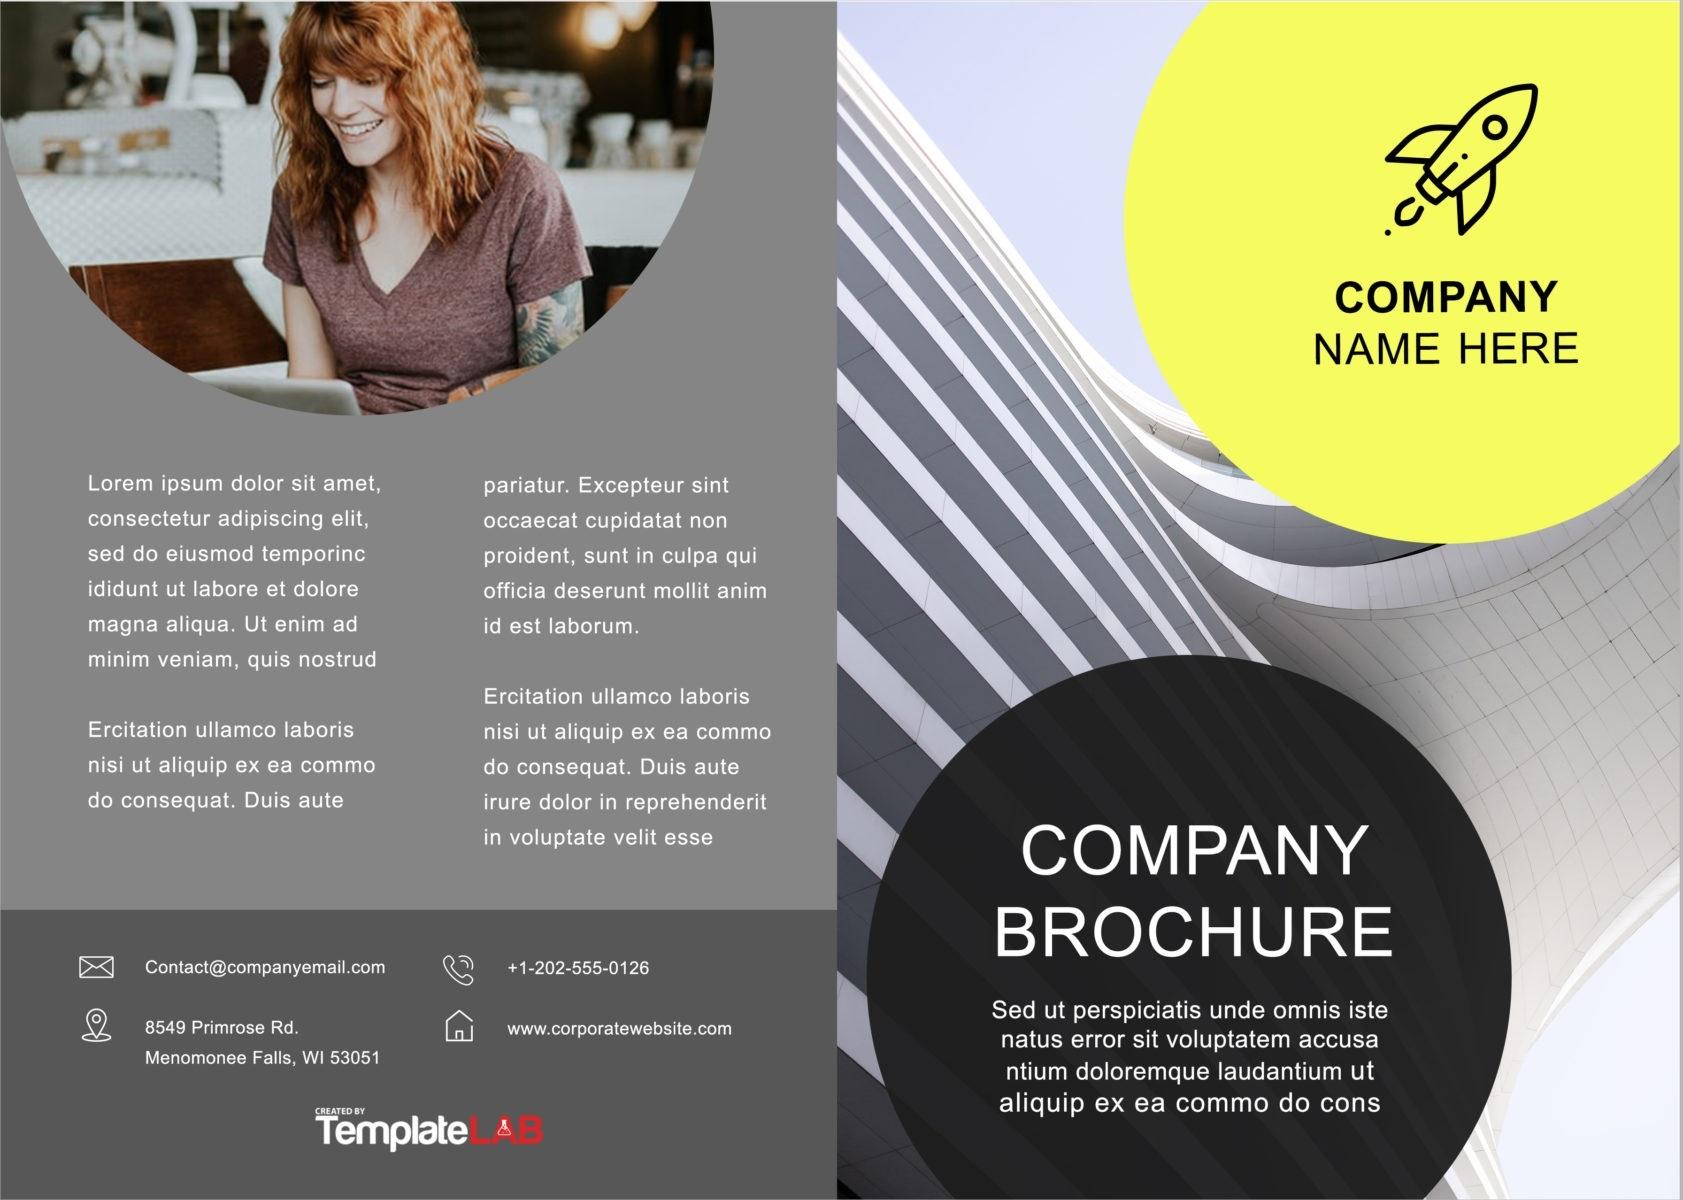 004 Unusual Free Online Brochure Template Photo  Templates Download Microsoft Word Real EstateFull